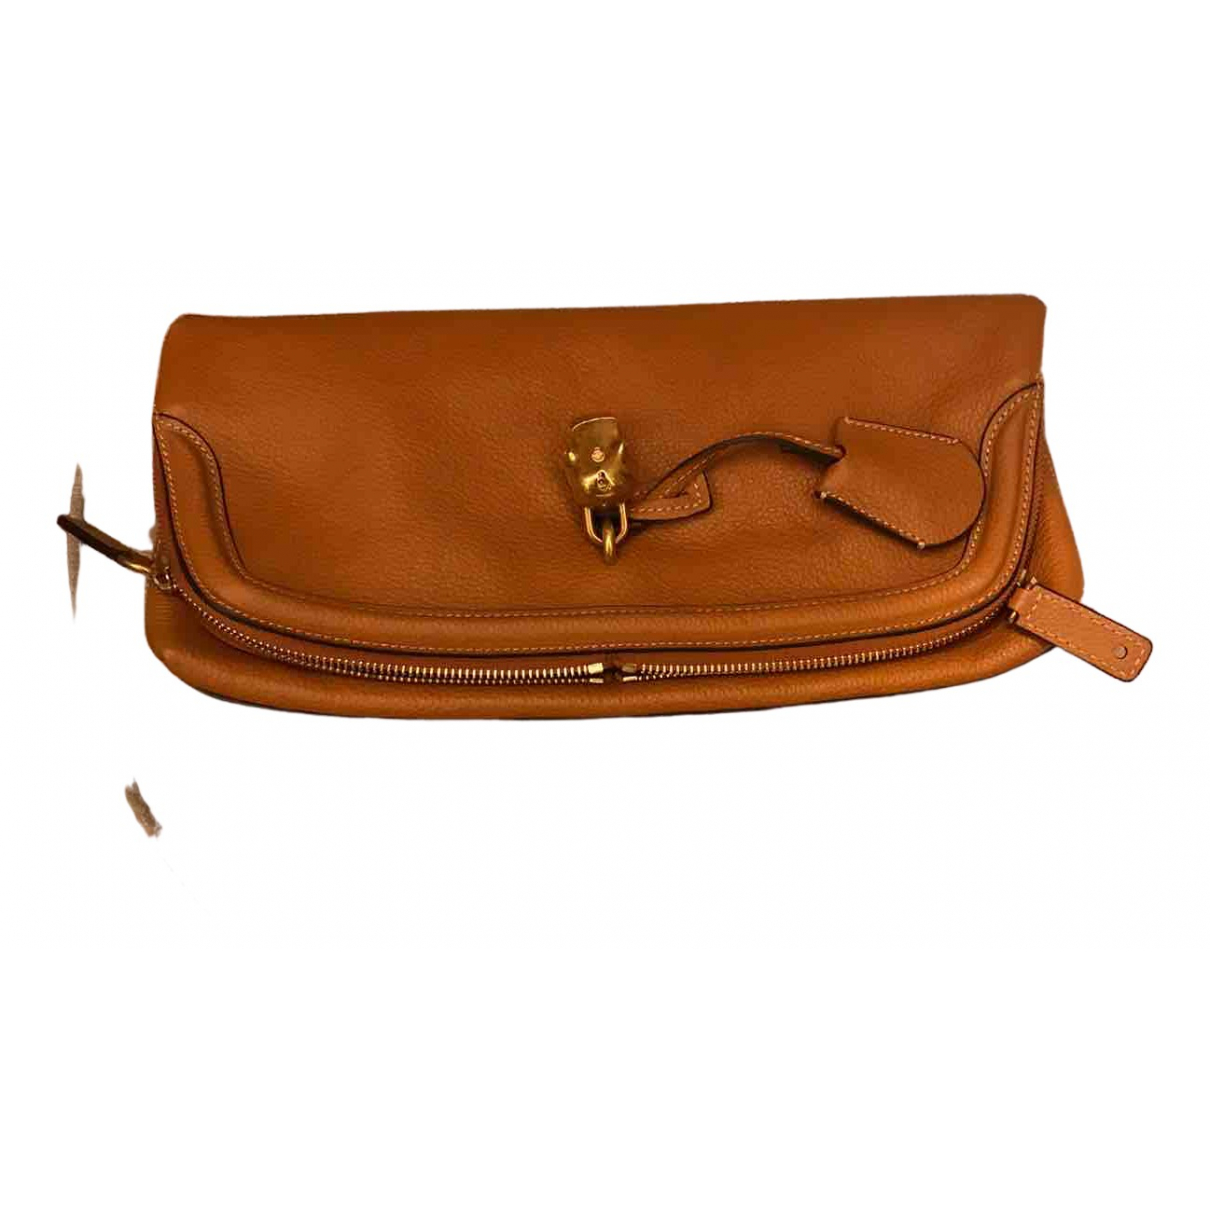 Alexander Mcqueen Skull Camel Leather Clutch bag for Women N